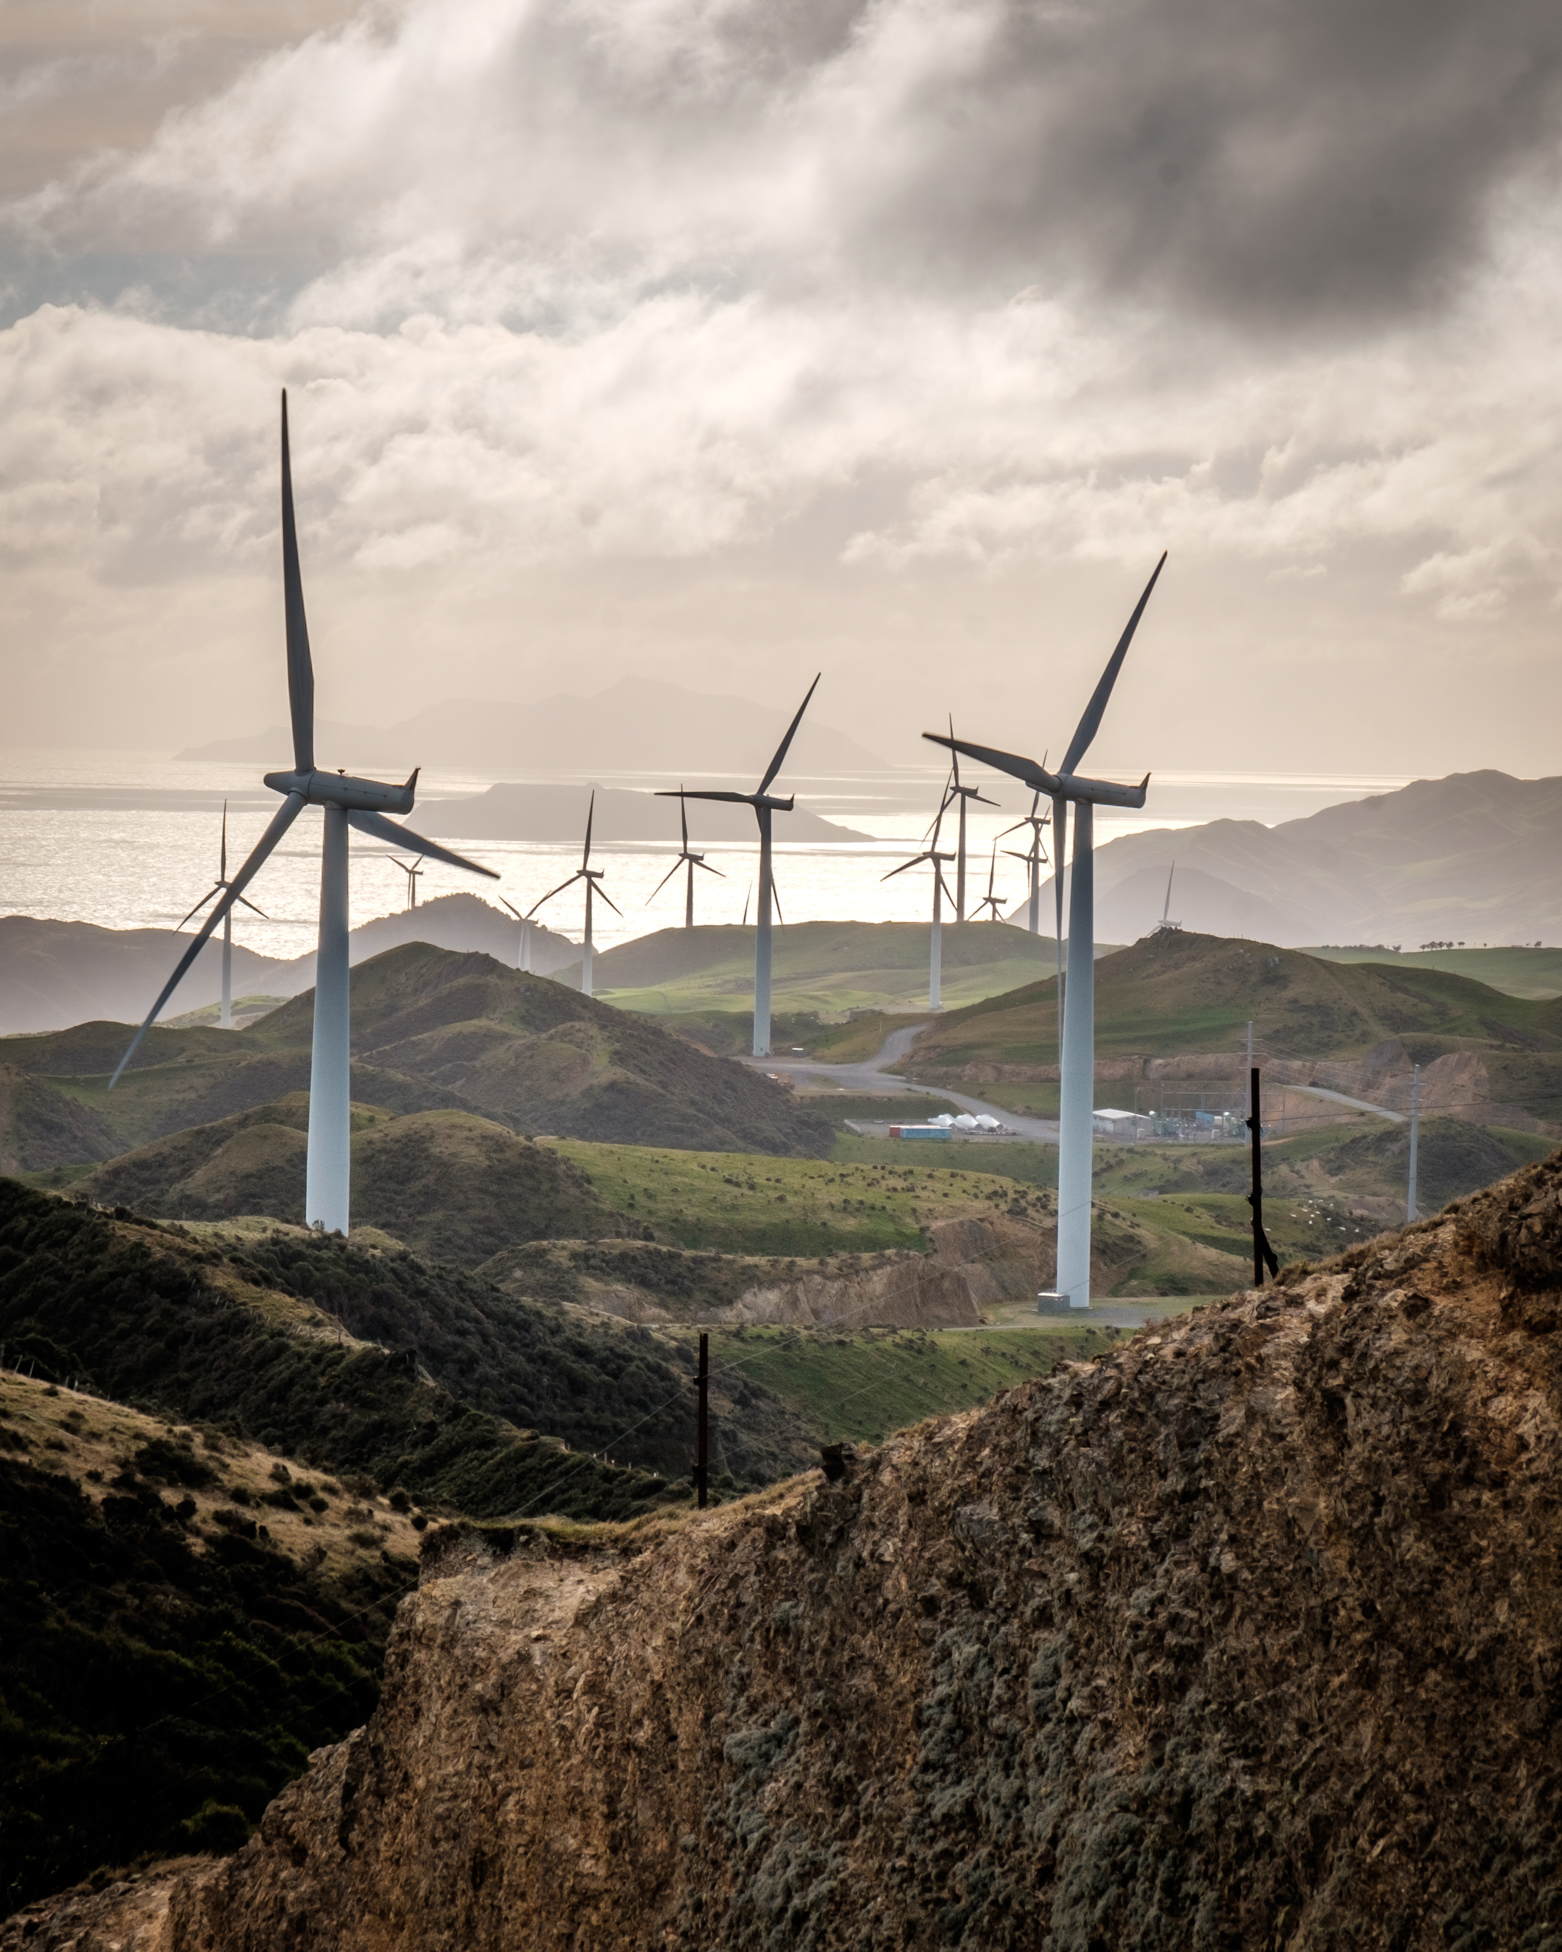 more turbines